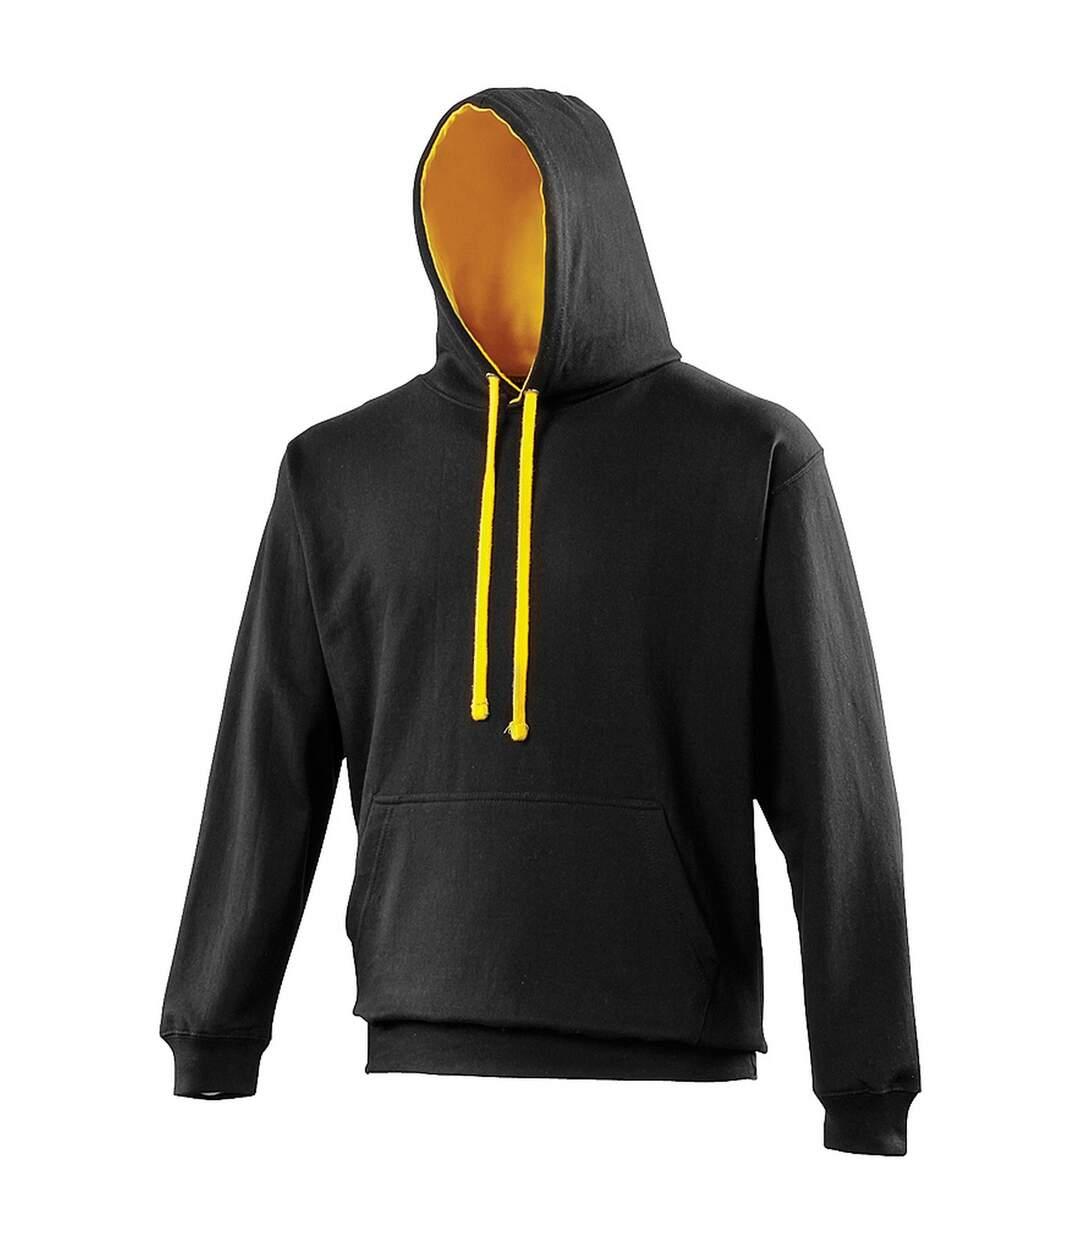 Awdis Varsity Hooded Sweatshirt / Hoodie (New French Navy/Heather Grey) - UTRW165